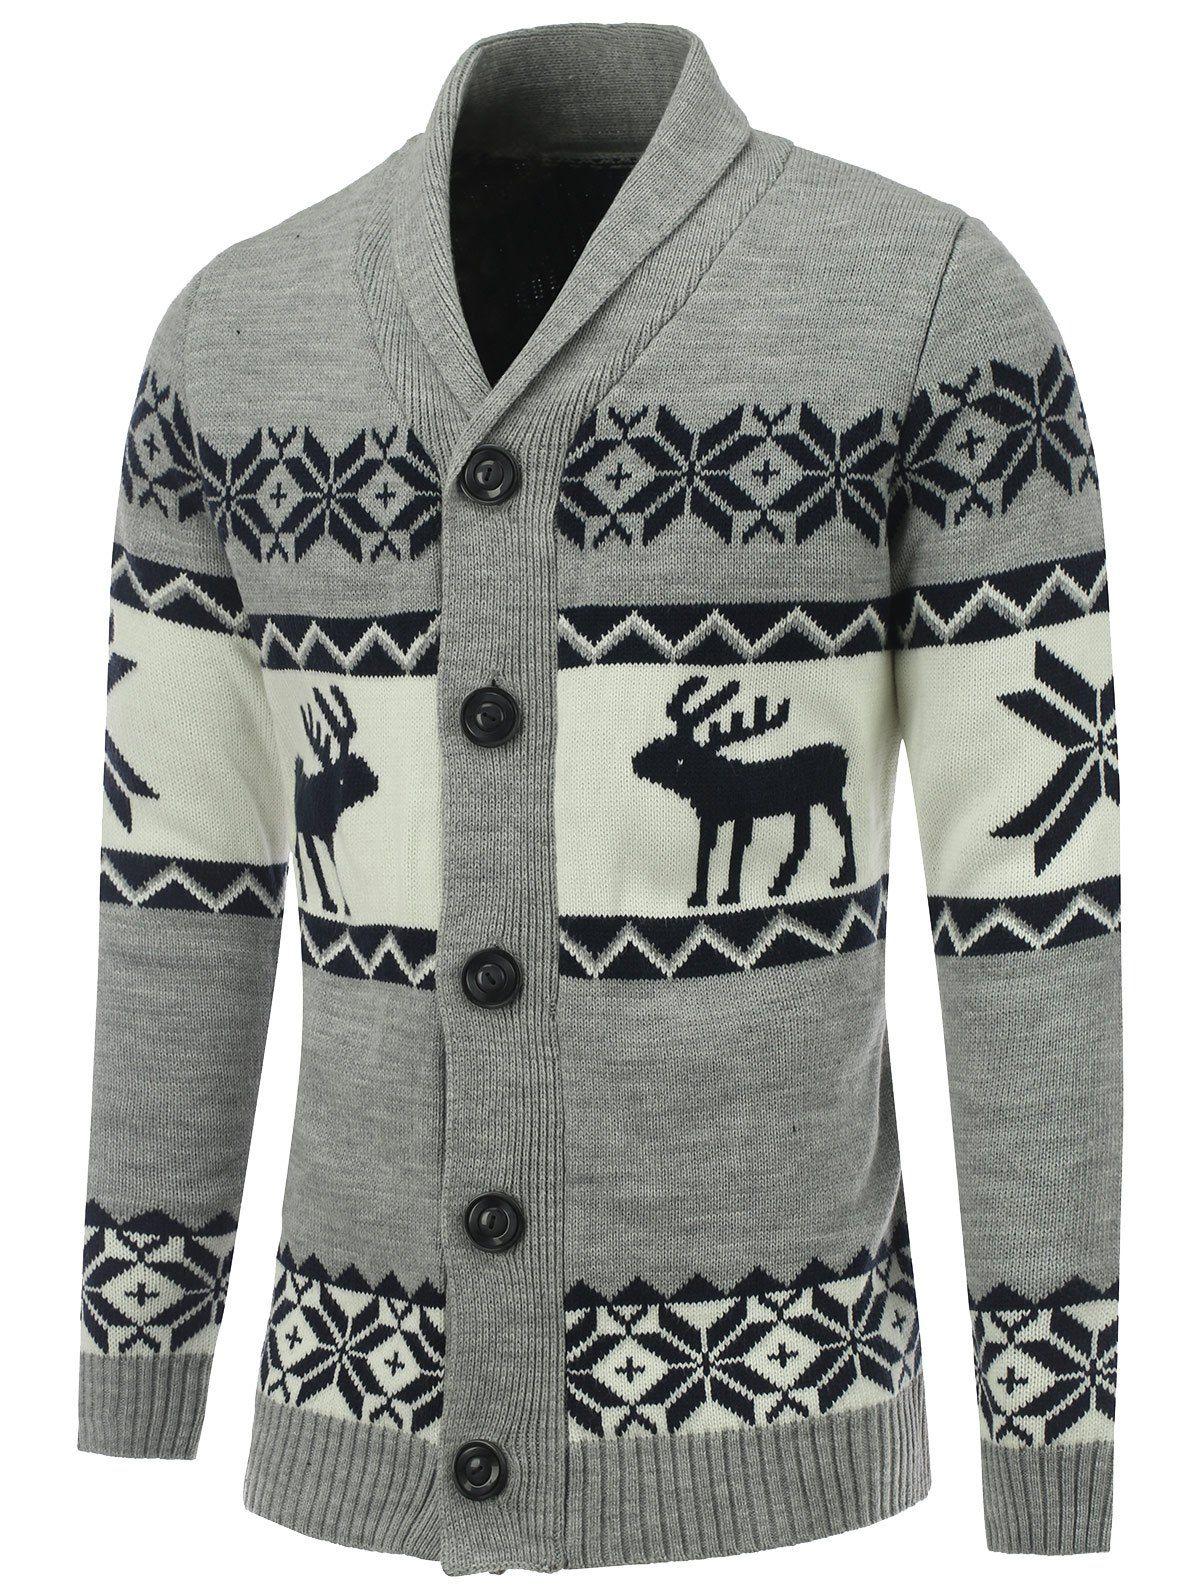 Sweater Christmas Men Christmas Reindeer Snow Snowflakes Sweater Pullover Men Jumper Sweaters